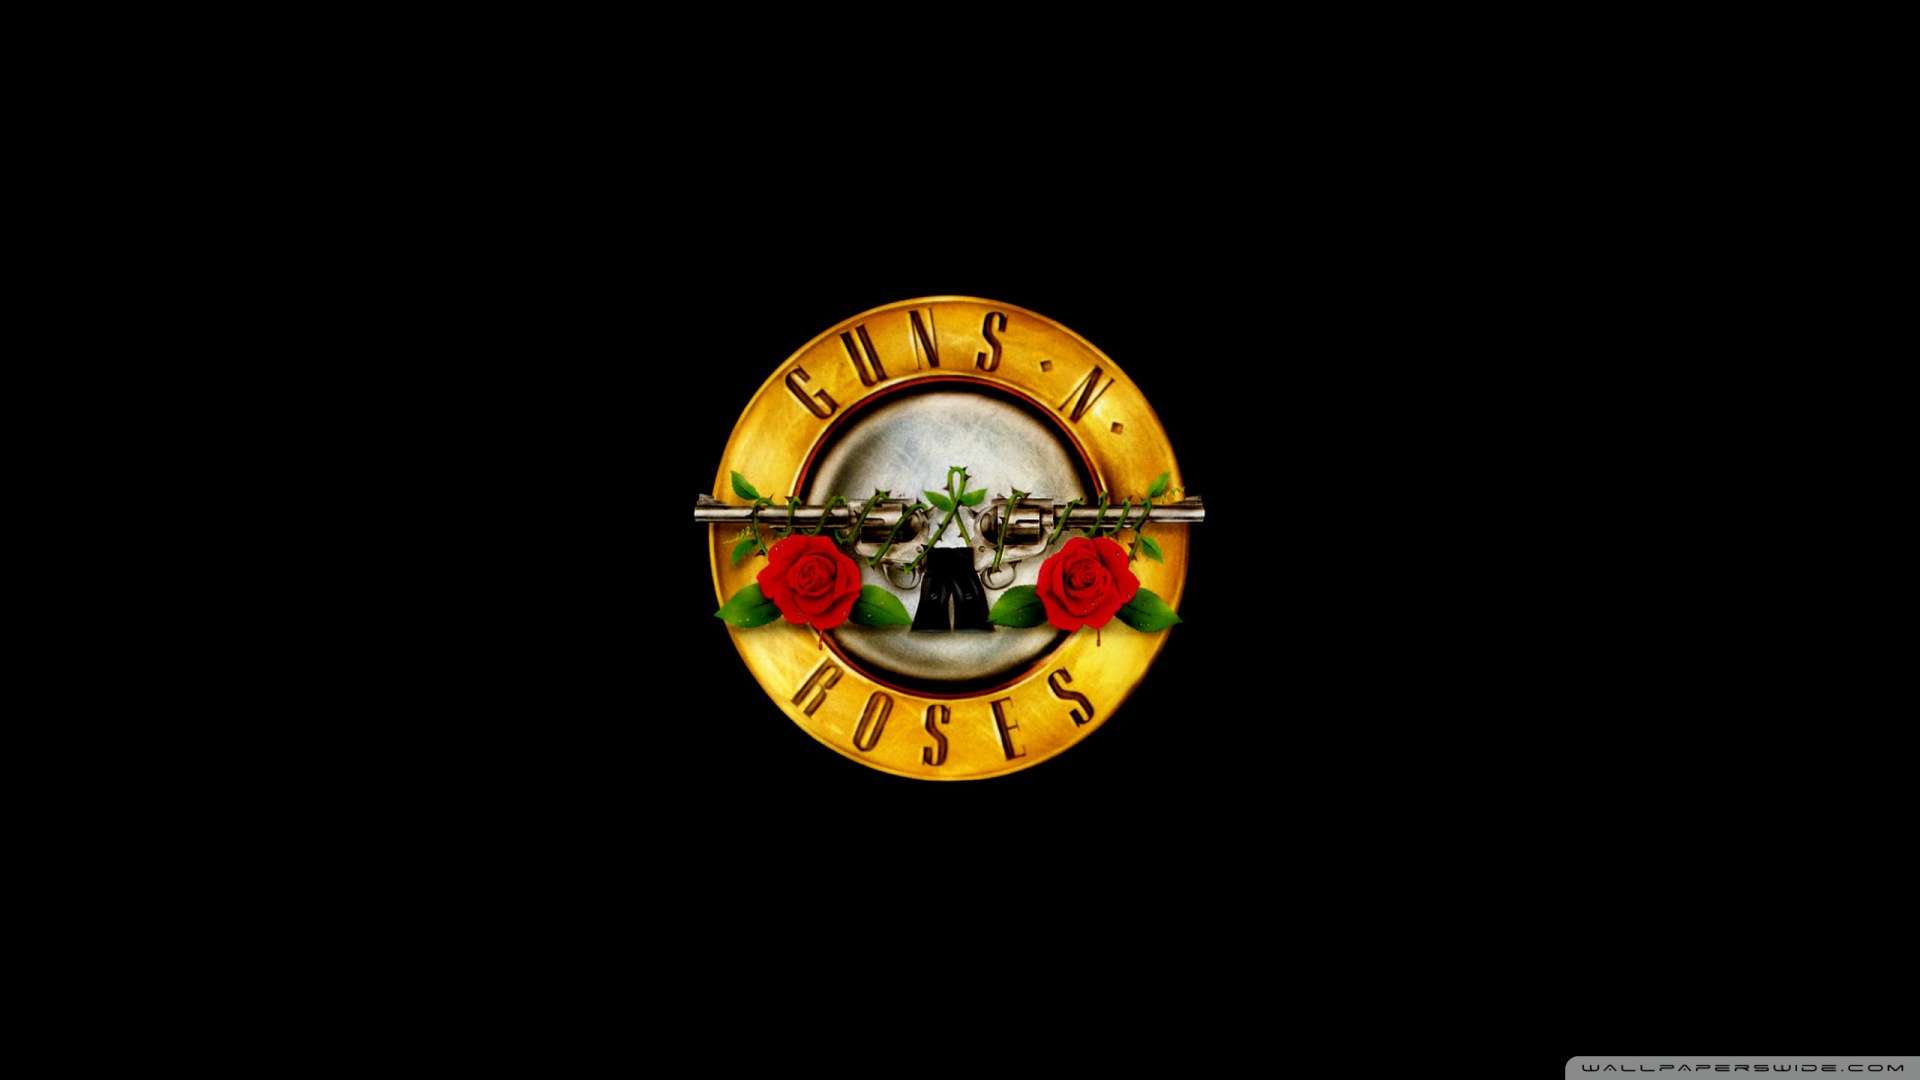 Download Guns N Roses Logo Hd Wallpaper 1920x1080 1920x1080